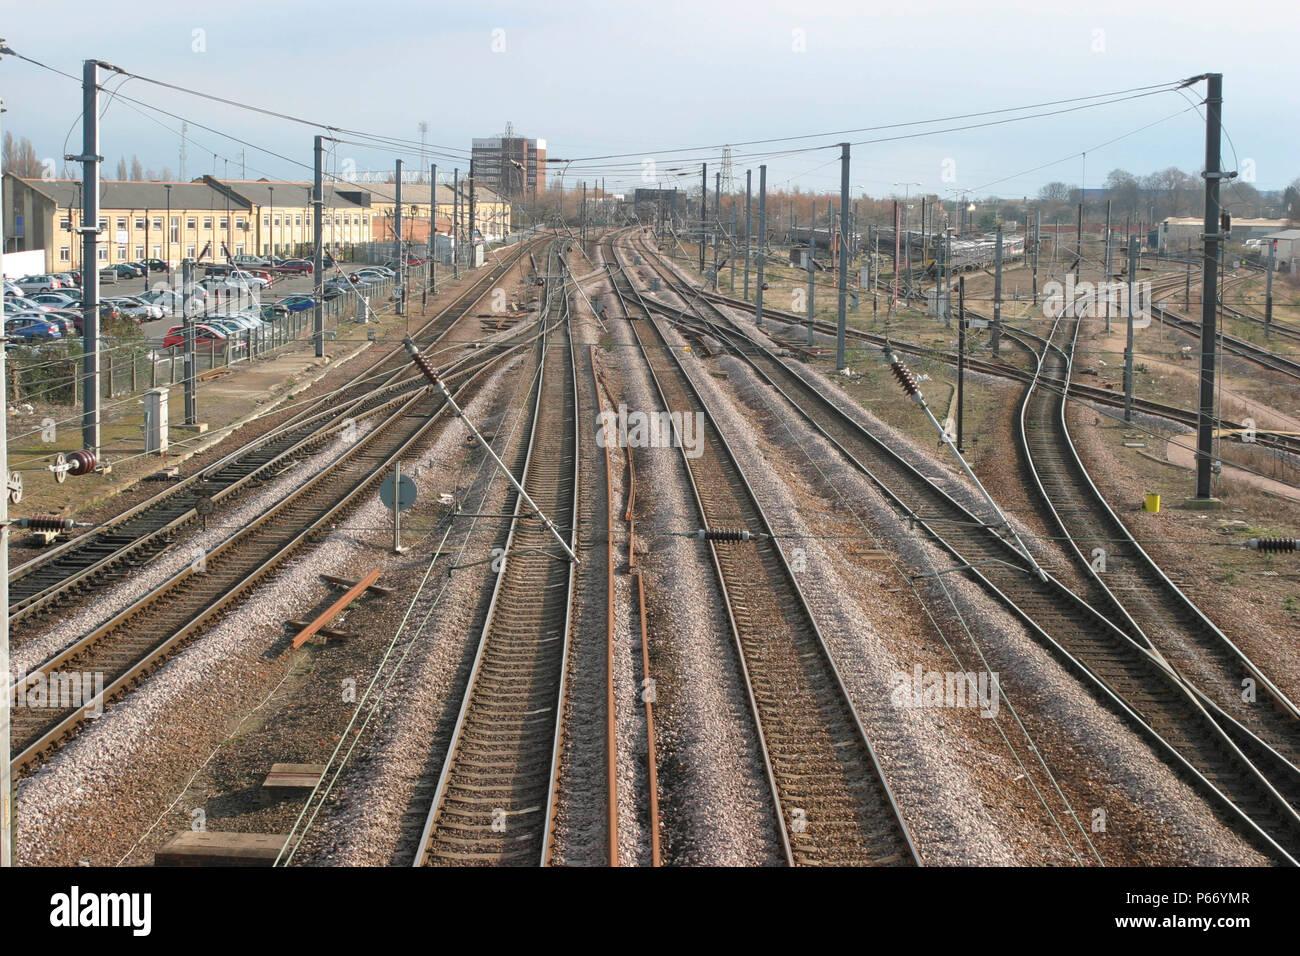 Railway tracks and sidings at Peterborough, ECML 2004 - Stock Image